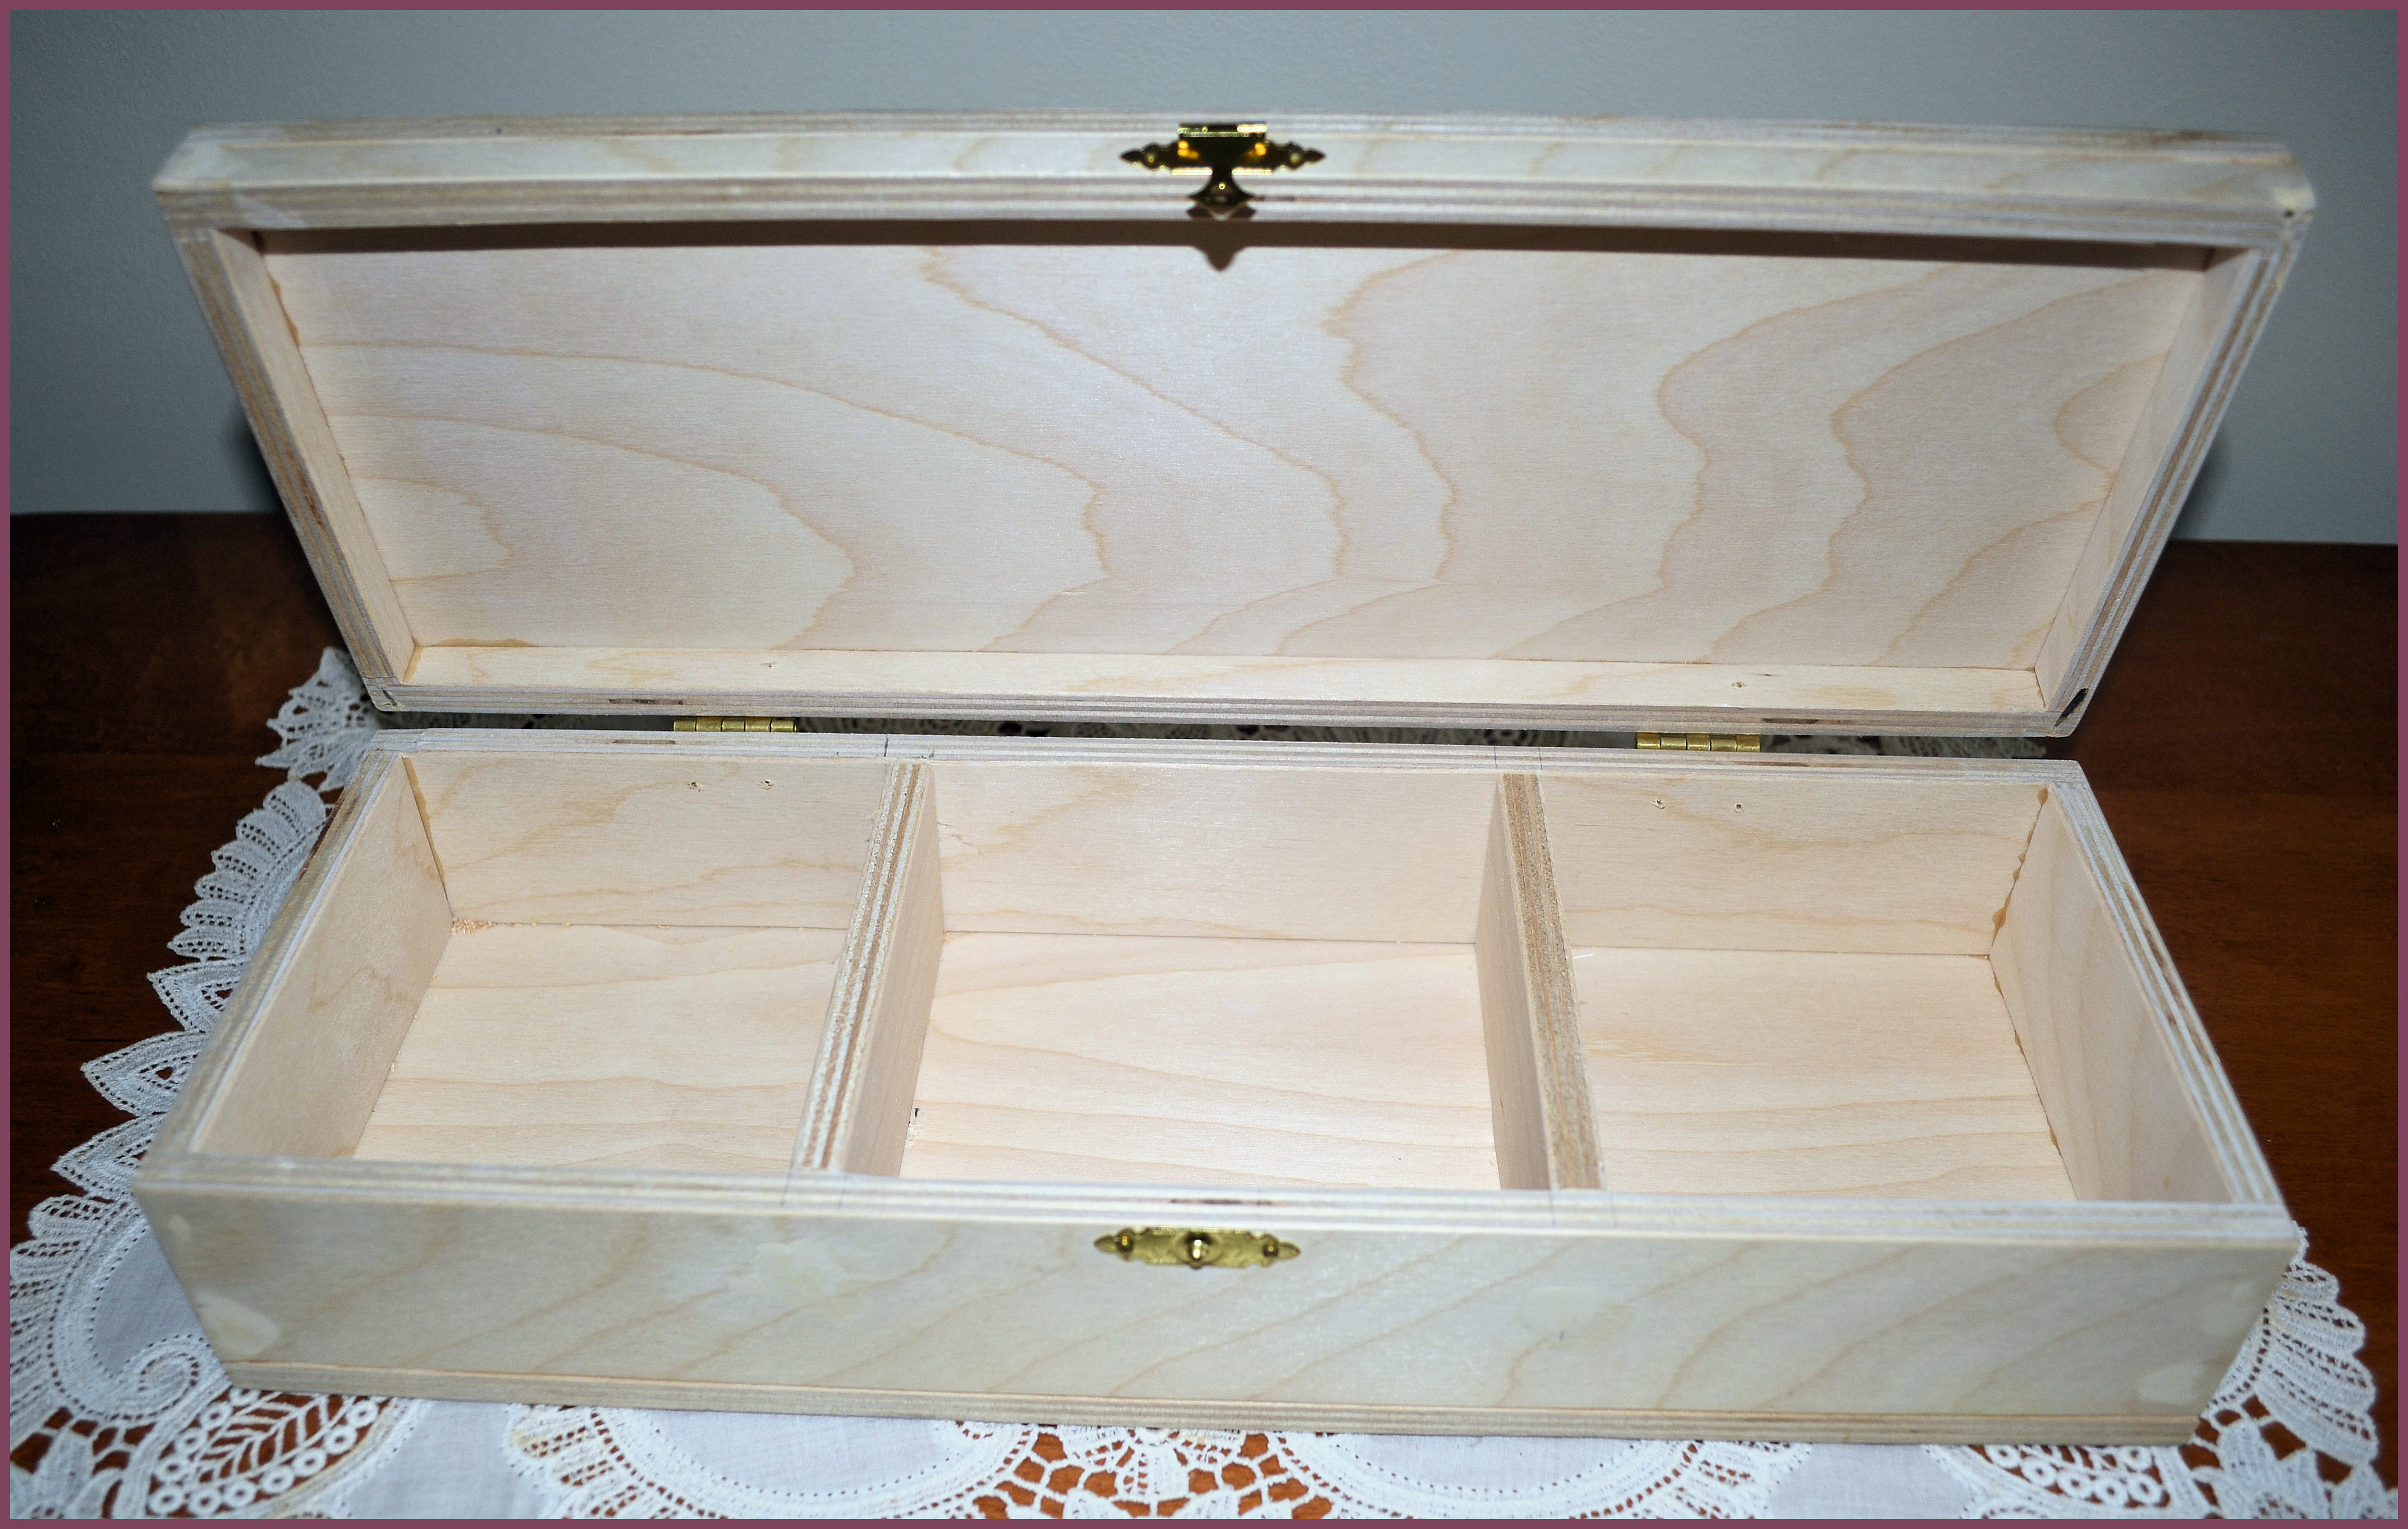 wood-jewlry-box-19230035-opened-boarder.jpg